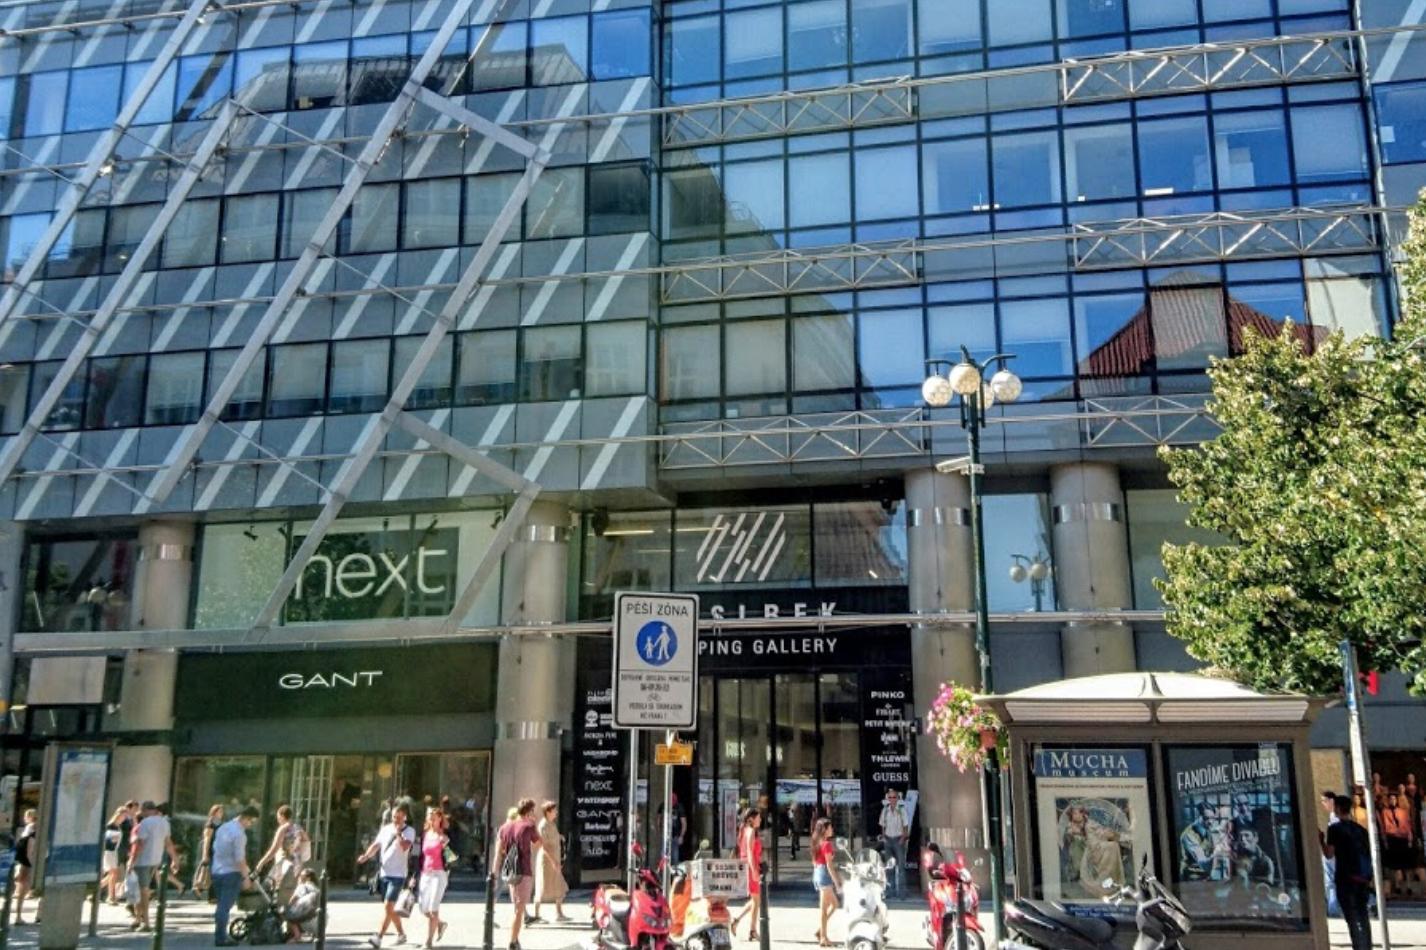 Торговый центр Nákupní galerie Myslbek (Мыслбек) в Праге